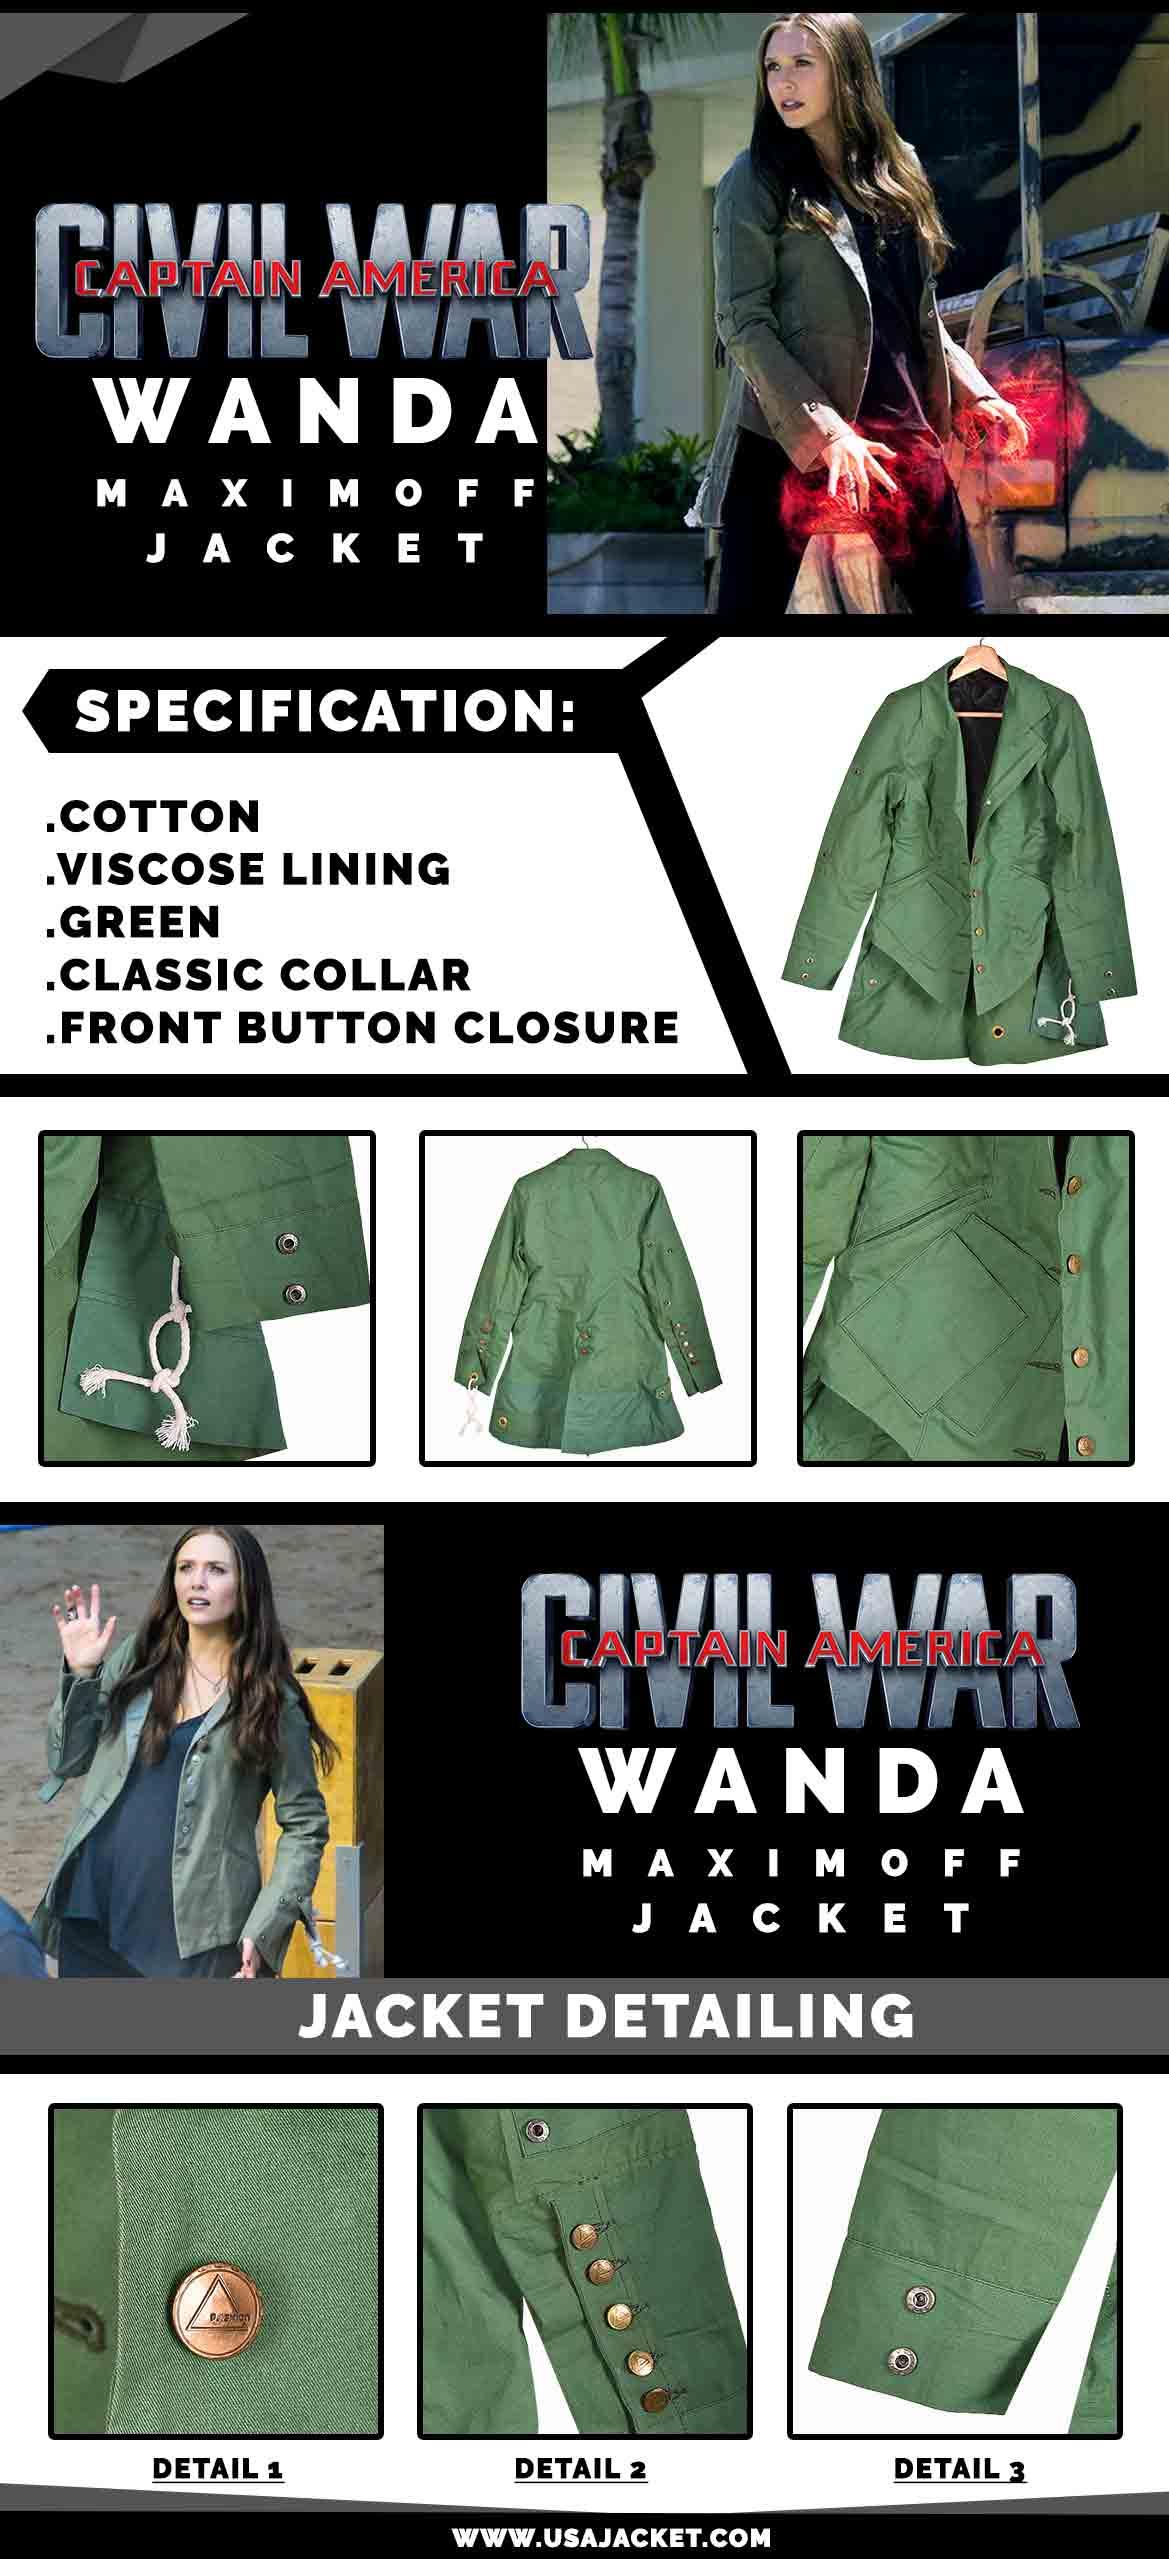 Wanda Maximoff Jacket